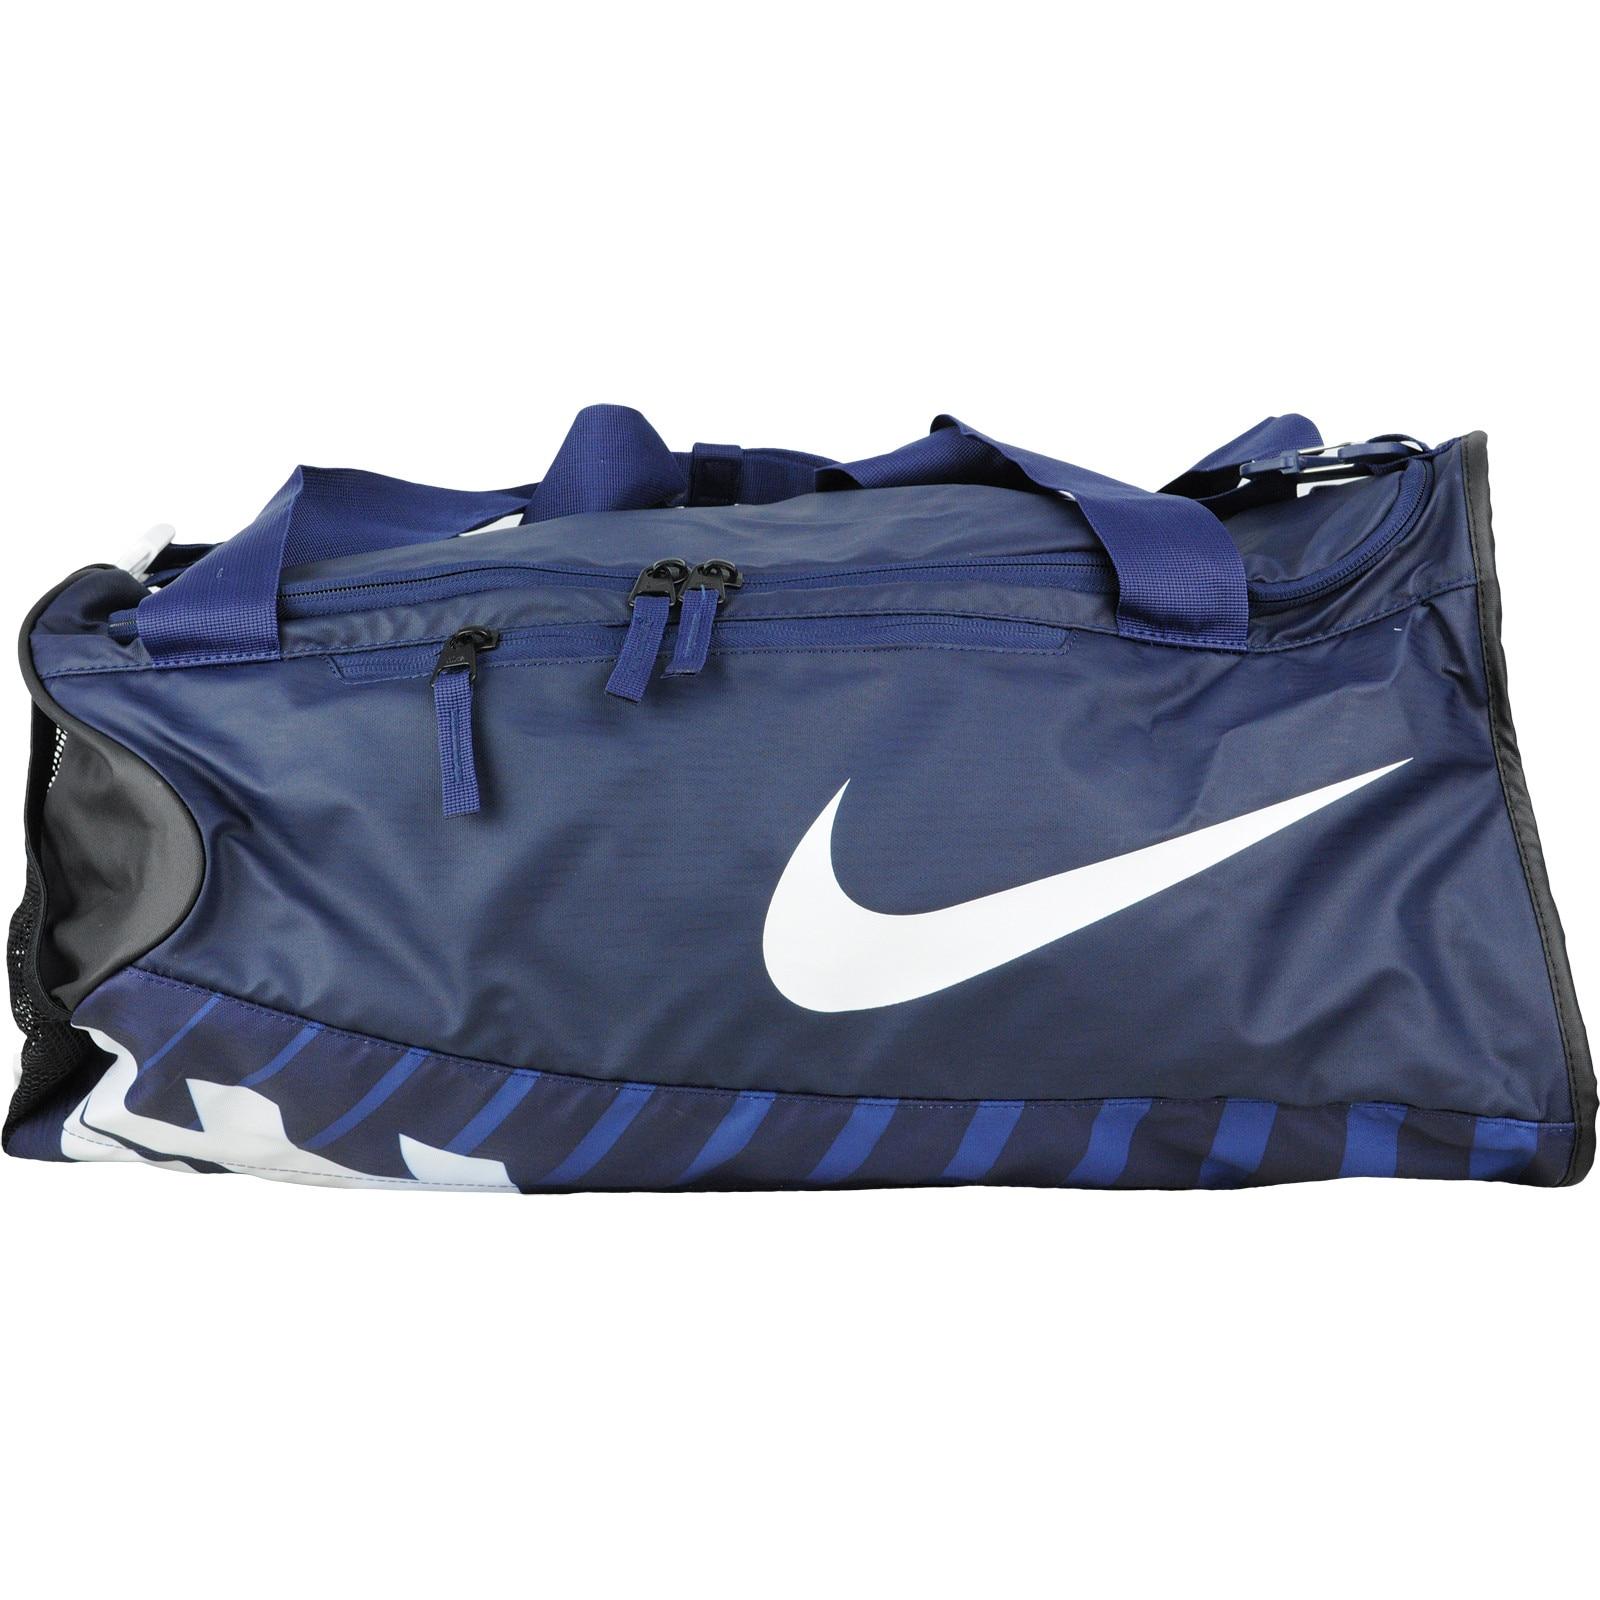 Chimenea Infidelidad líder  Geanta barbati Nike ALPH ADPT CRSSBDY DFFl-M Duffel Bag BA5182-410, M,  Albastru - eMAG.ro